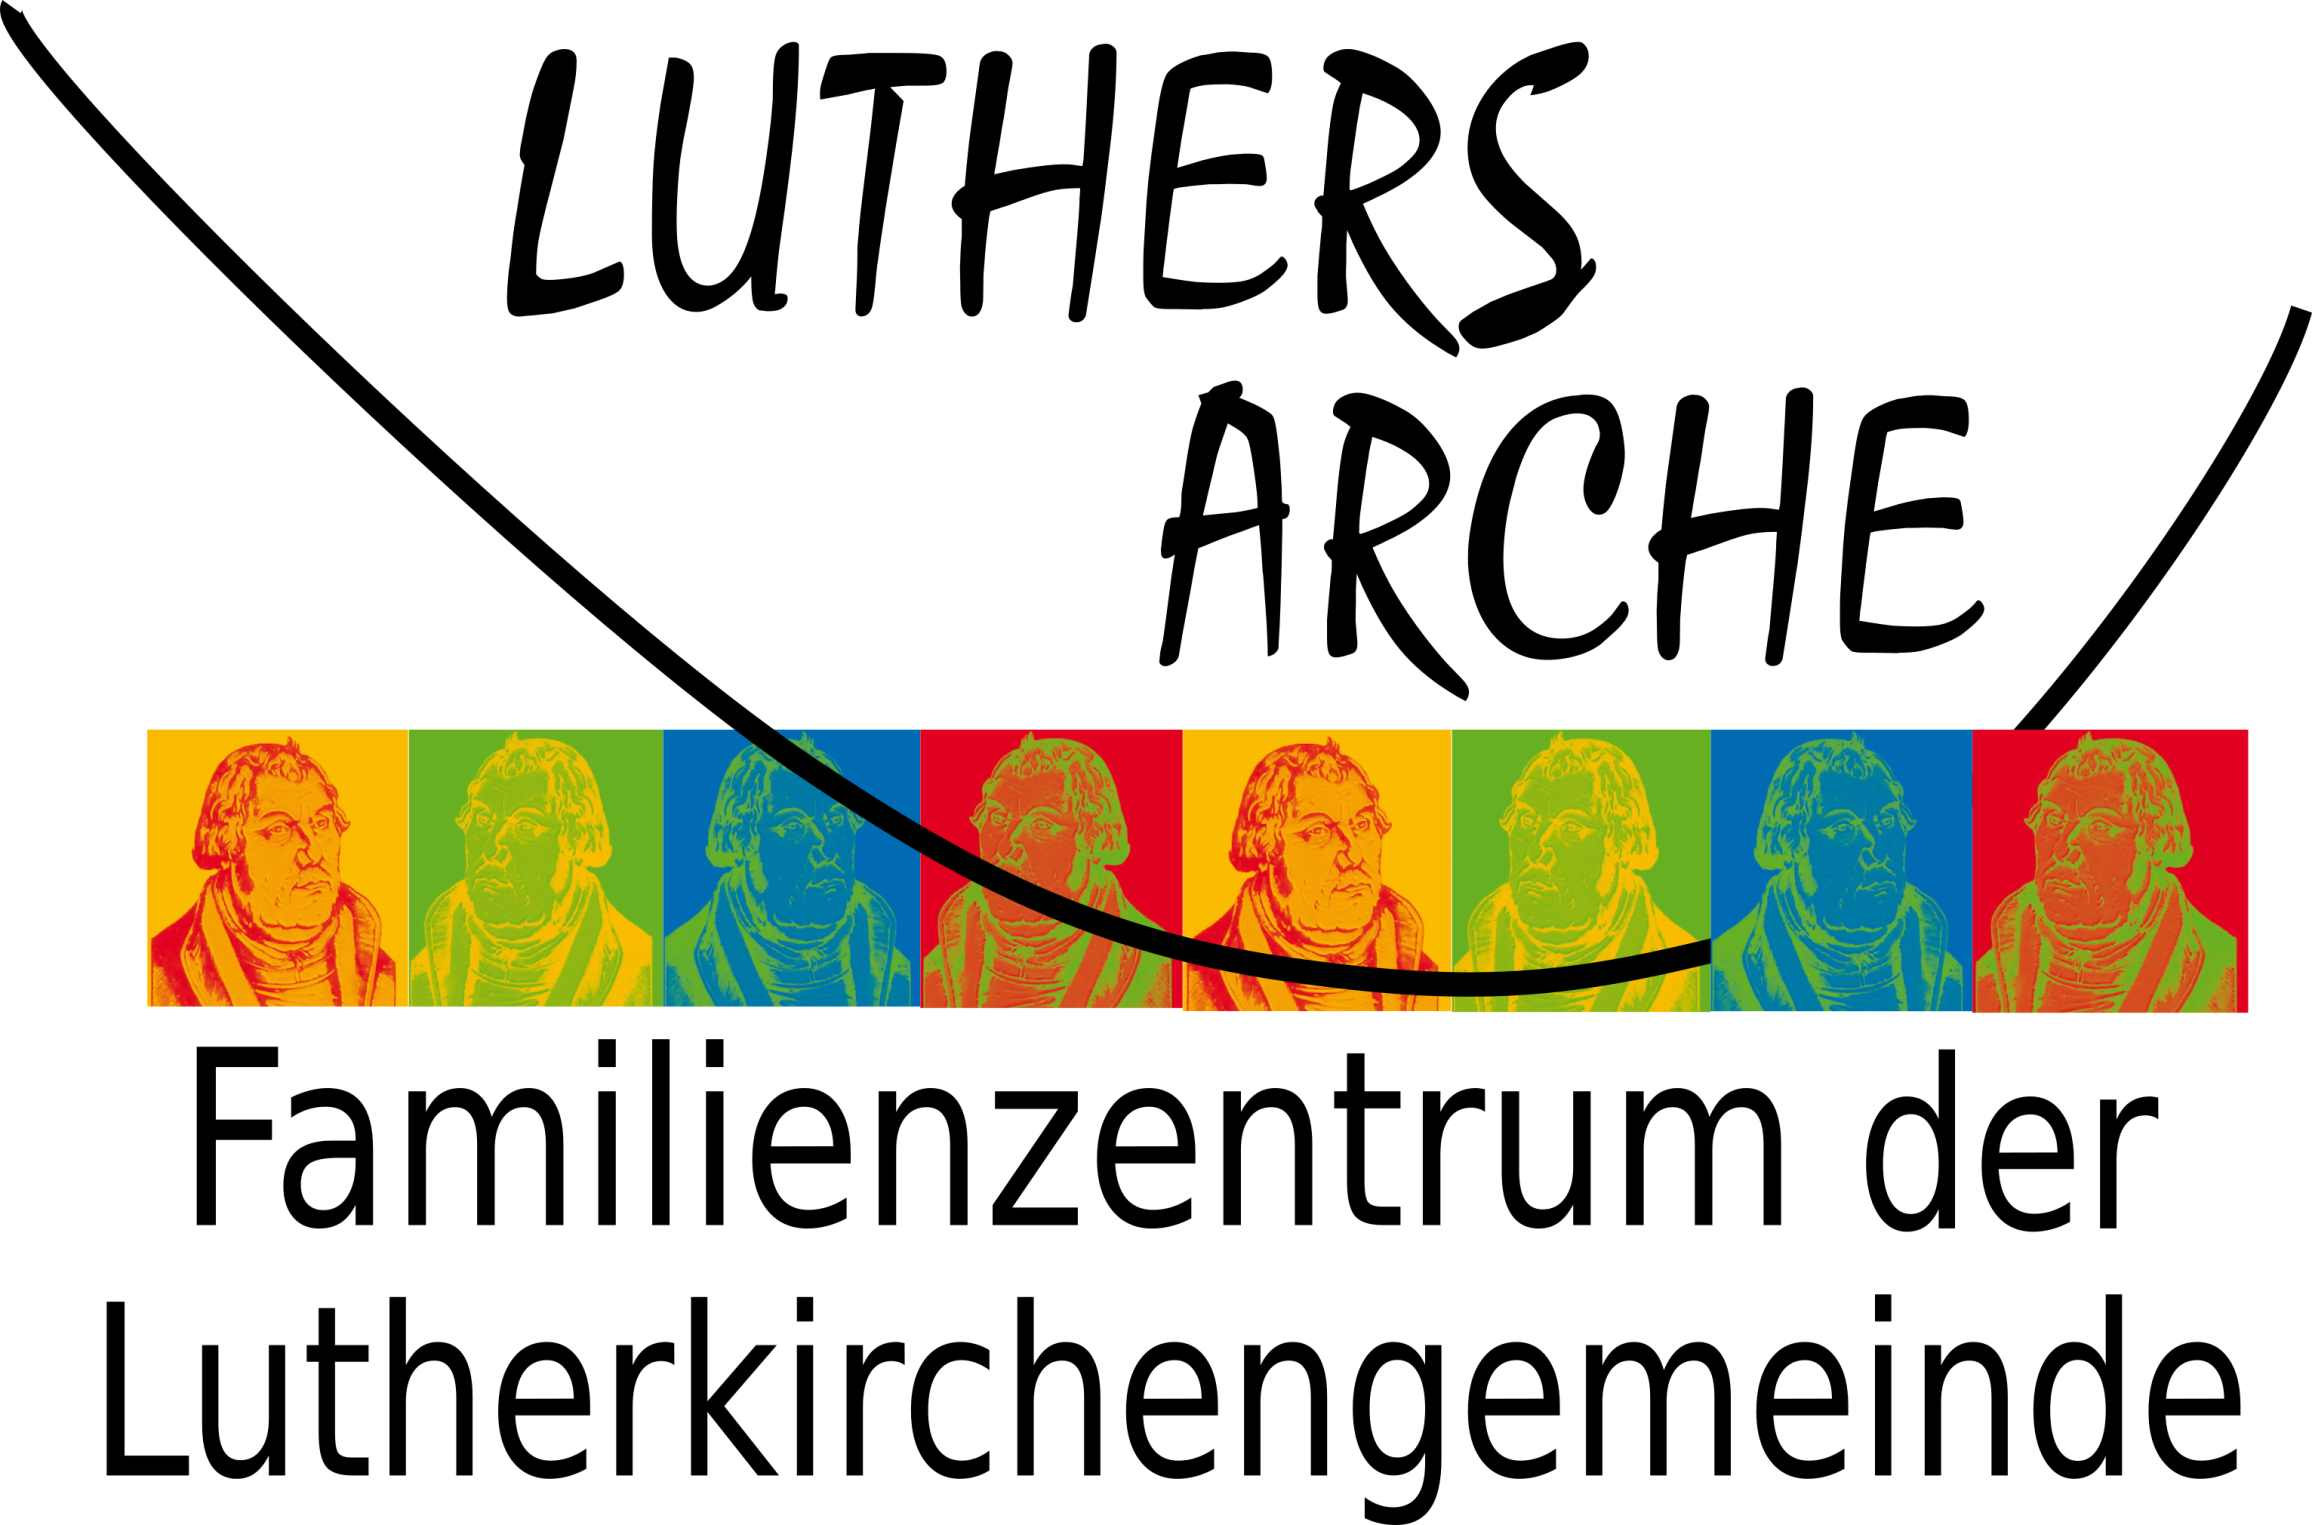 Familienzentrum Luthers Arche